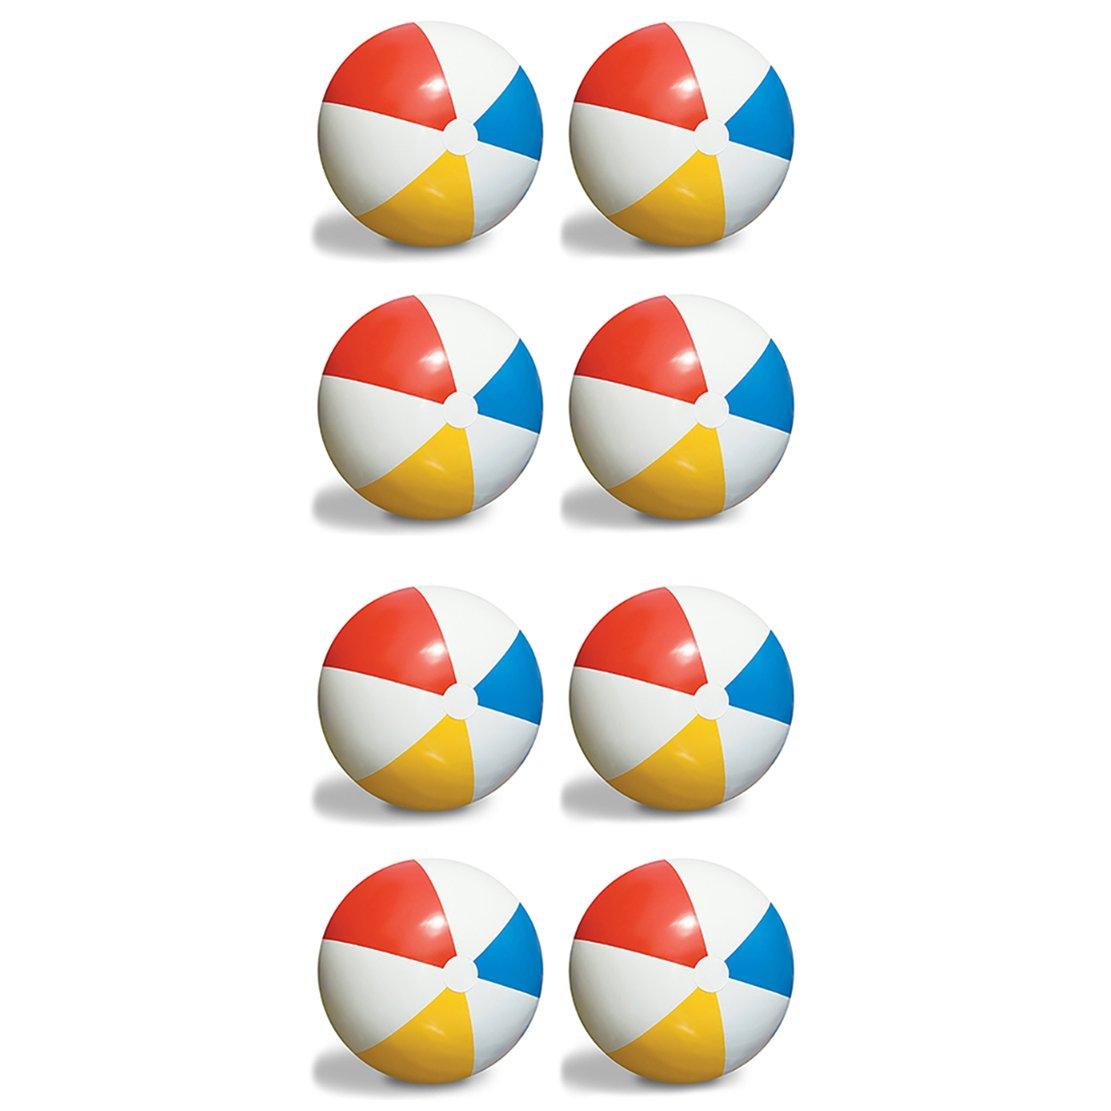 8-Pack Swimline Inflatable 36-Inch Classic Rainbow Giant Beach Balls | 8 x 90036